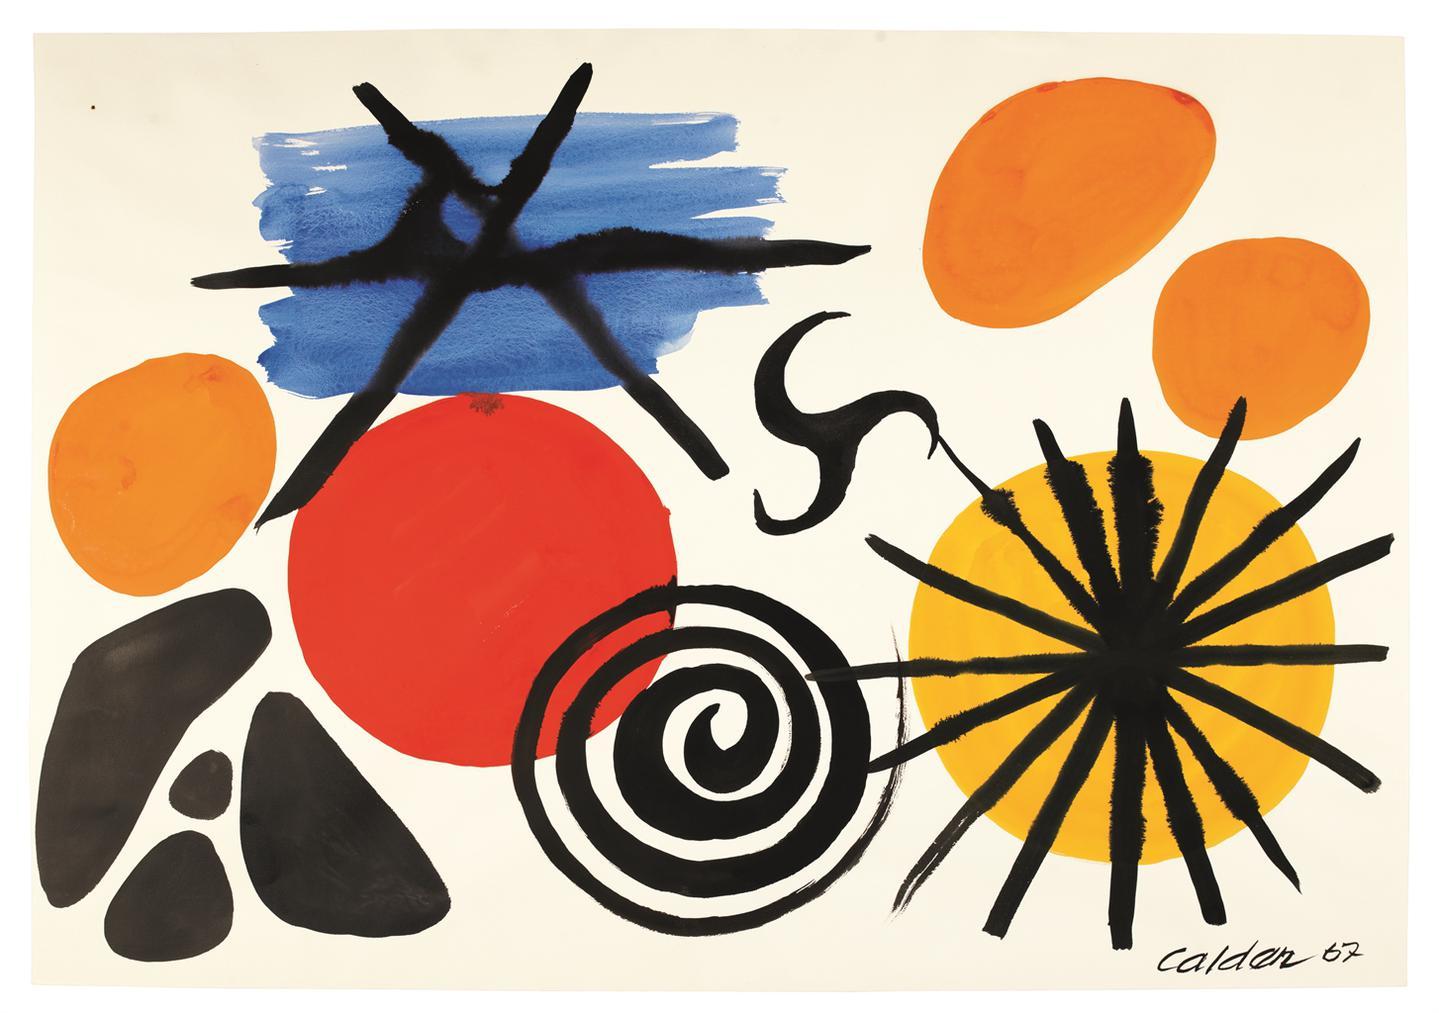 Alexander Calder-Propeller In The Center-1967